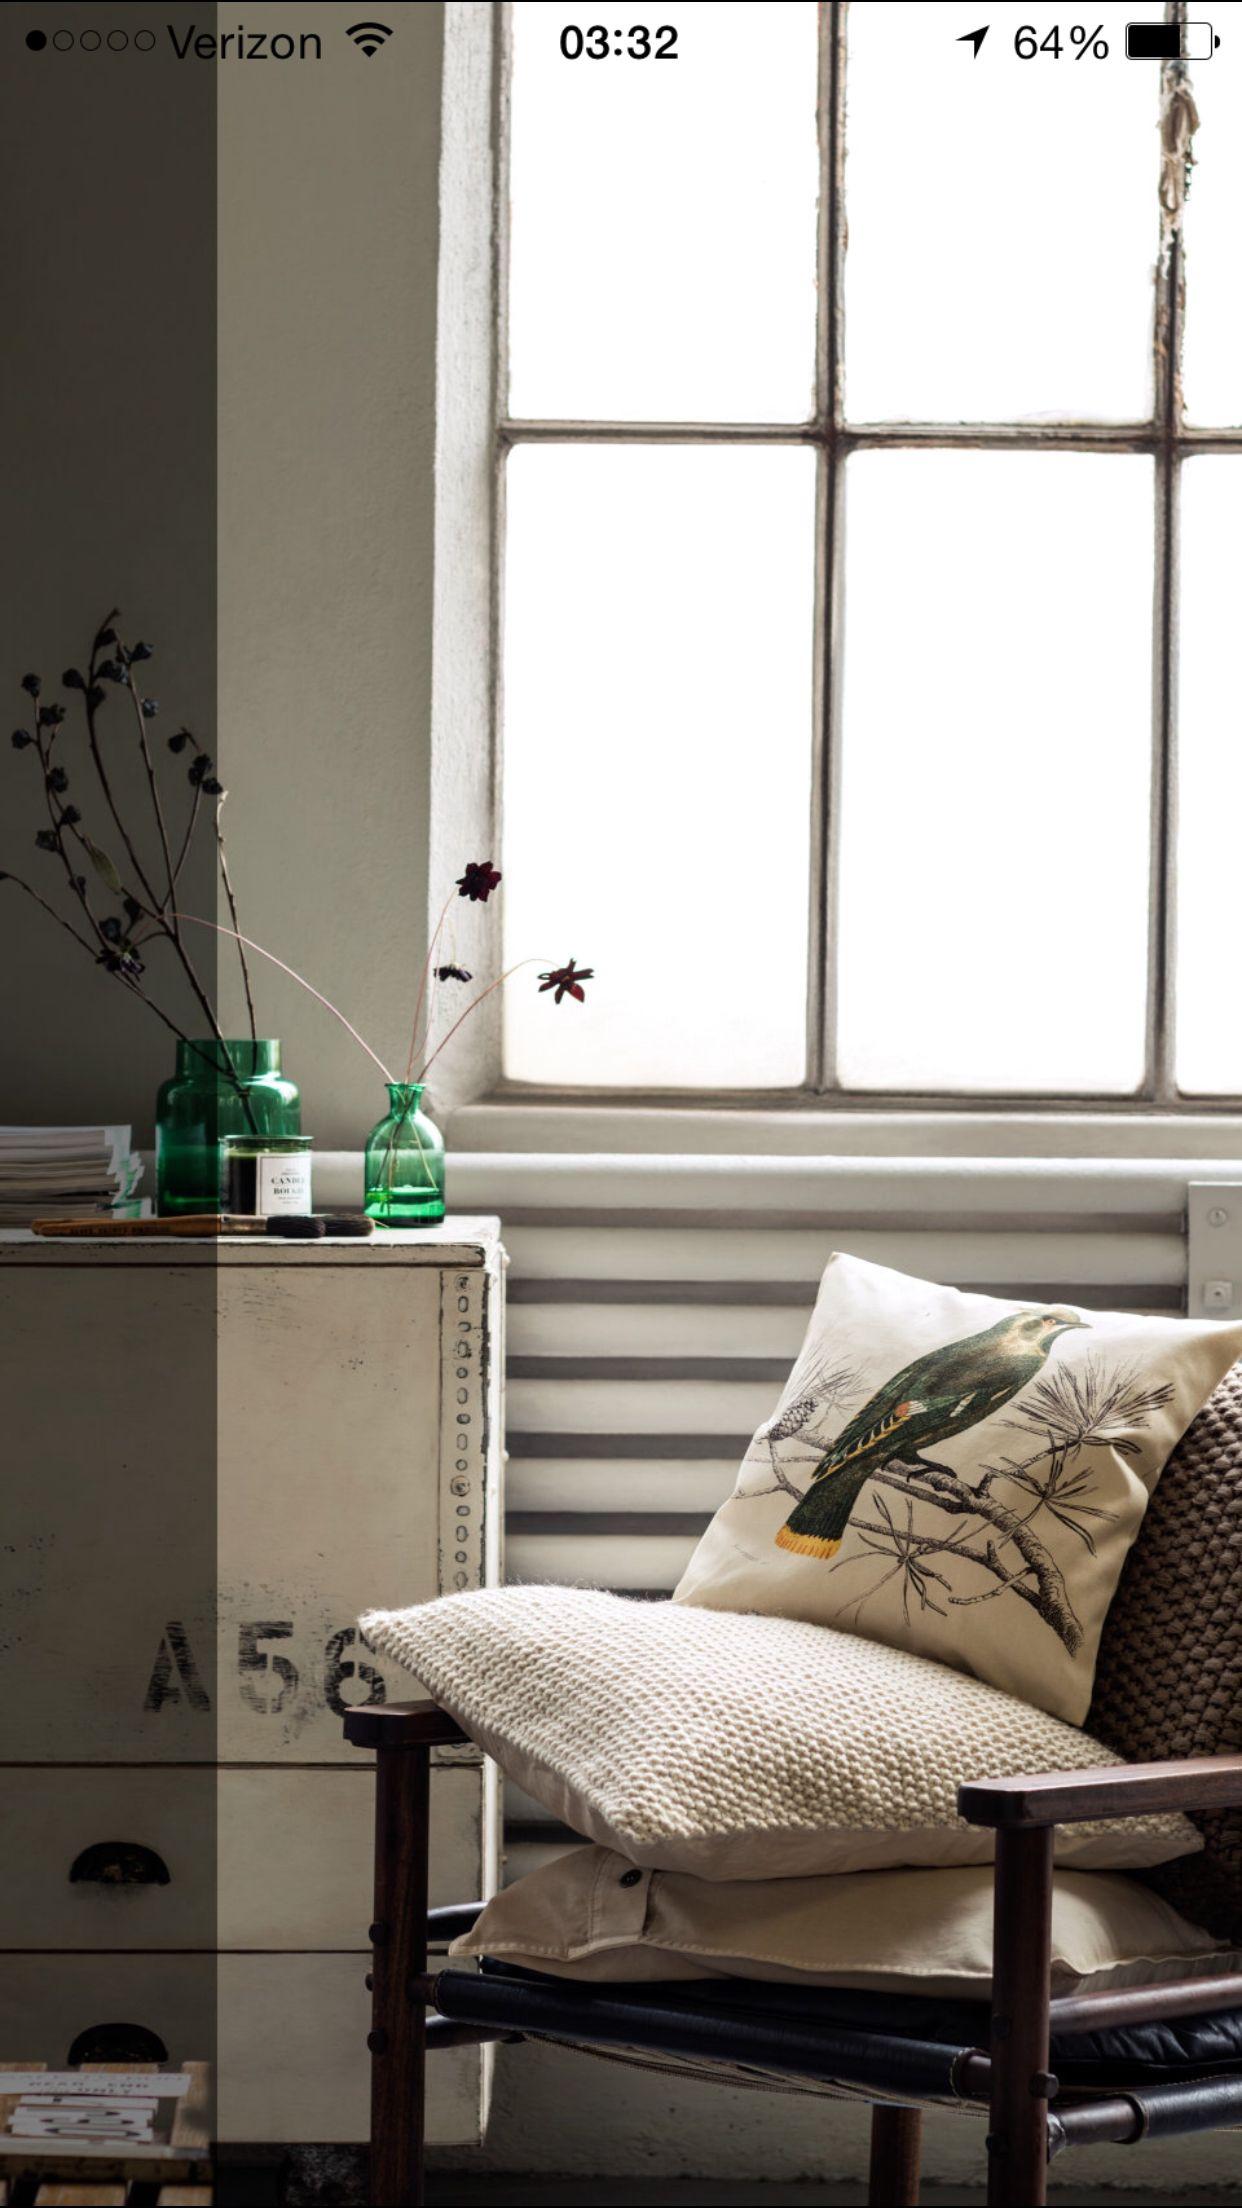 H&M Home | Home decor furniture, Home decor, Home